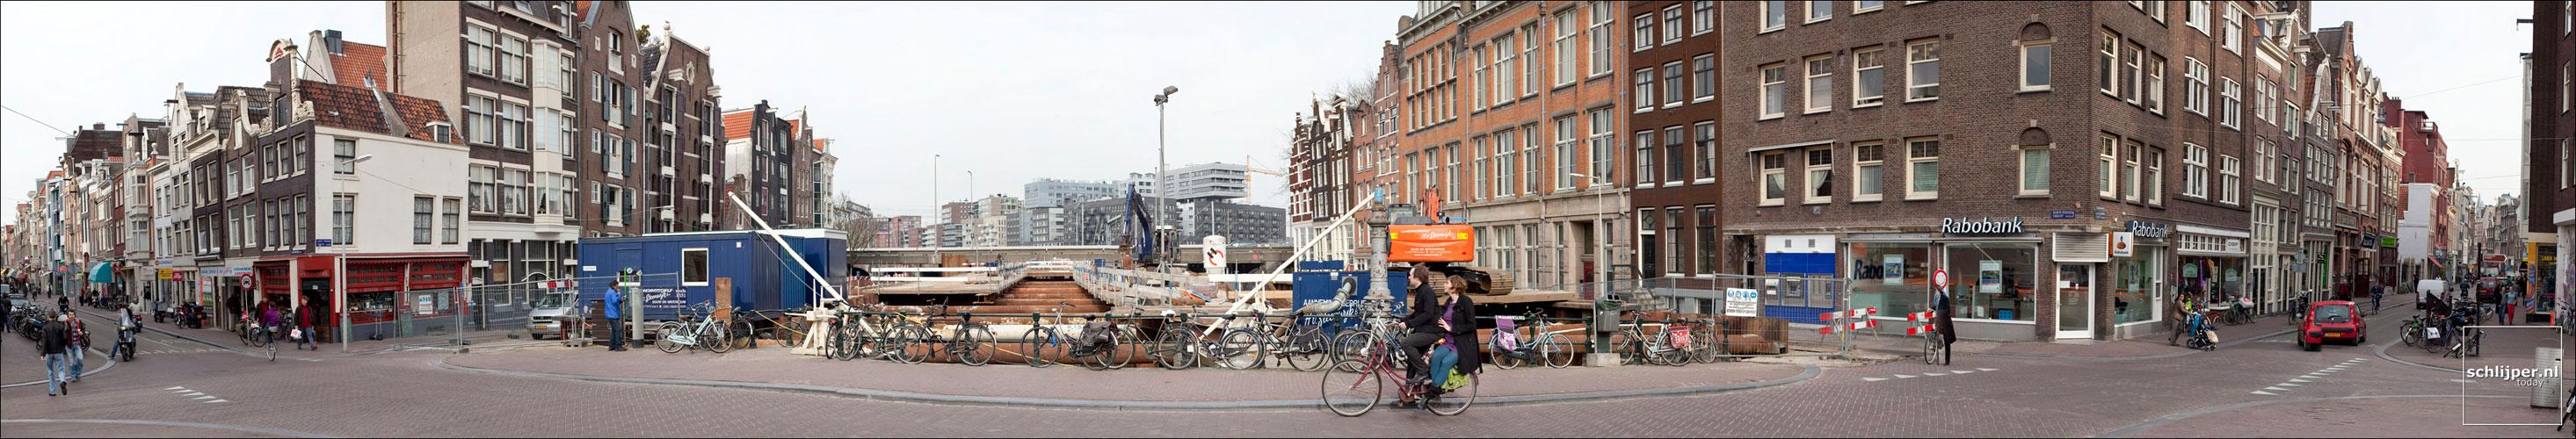 Nederland, Amsterdam, 2 maart 2010